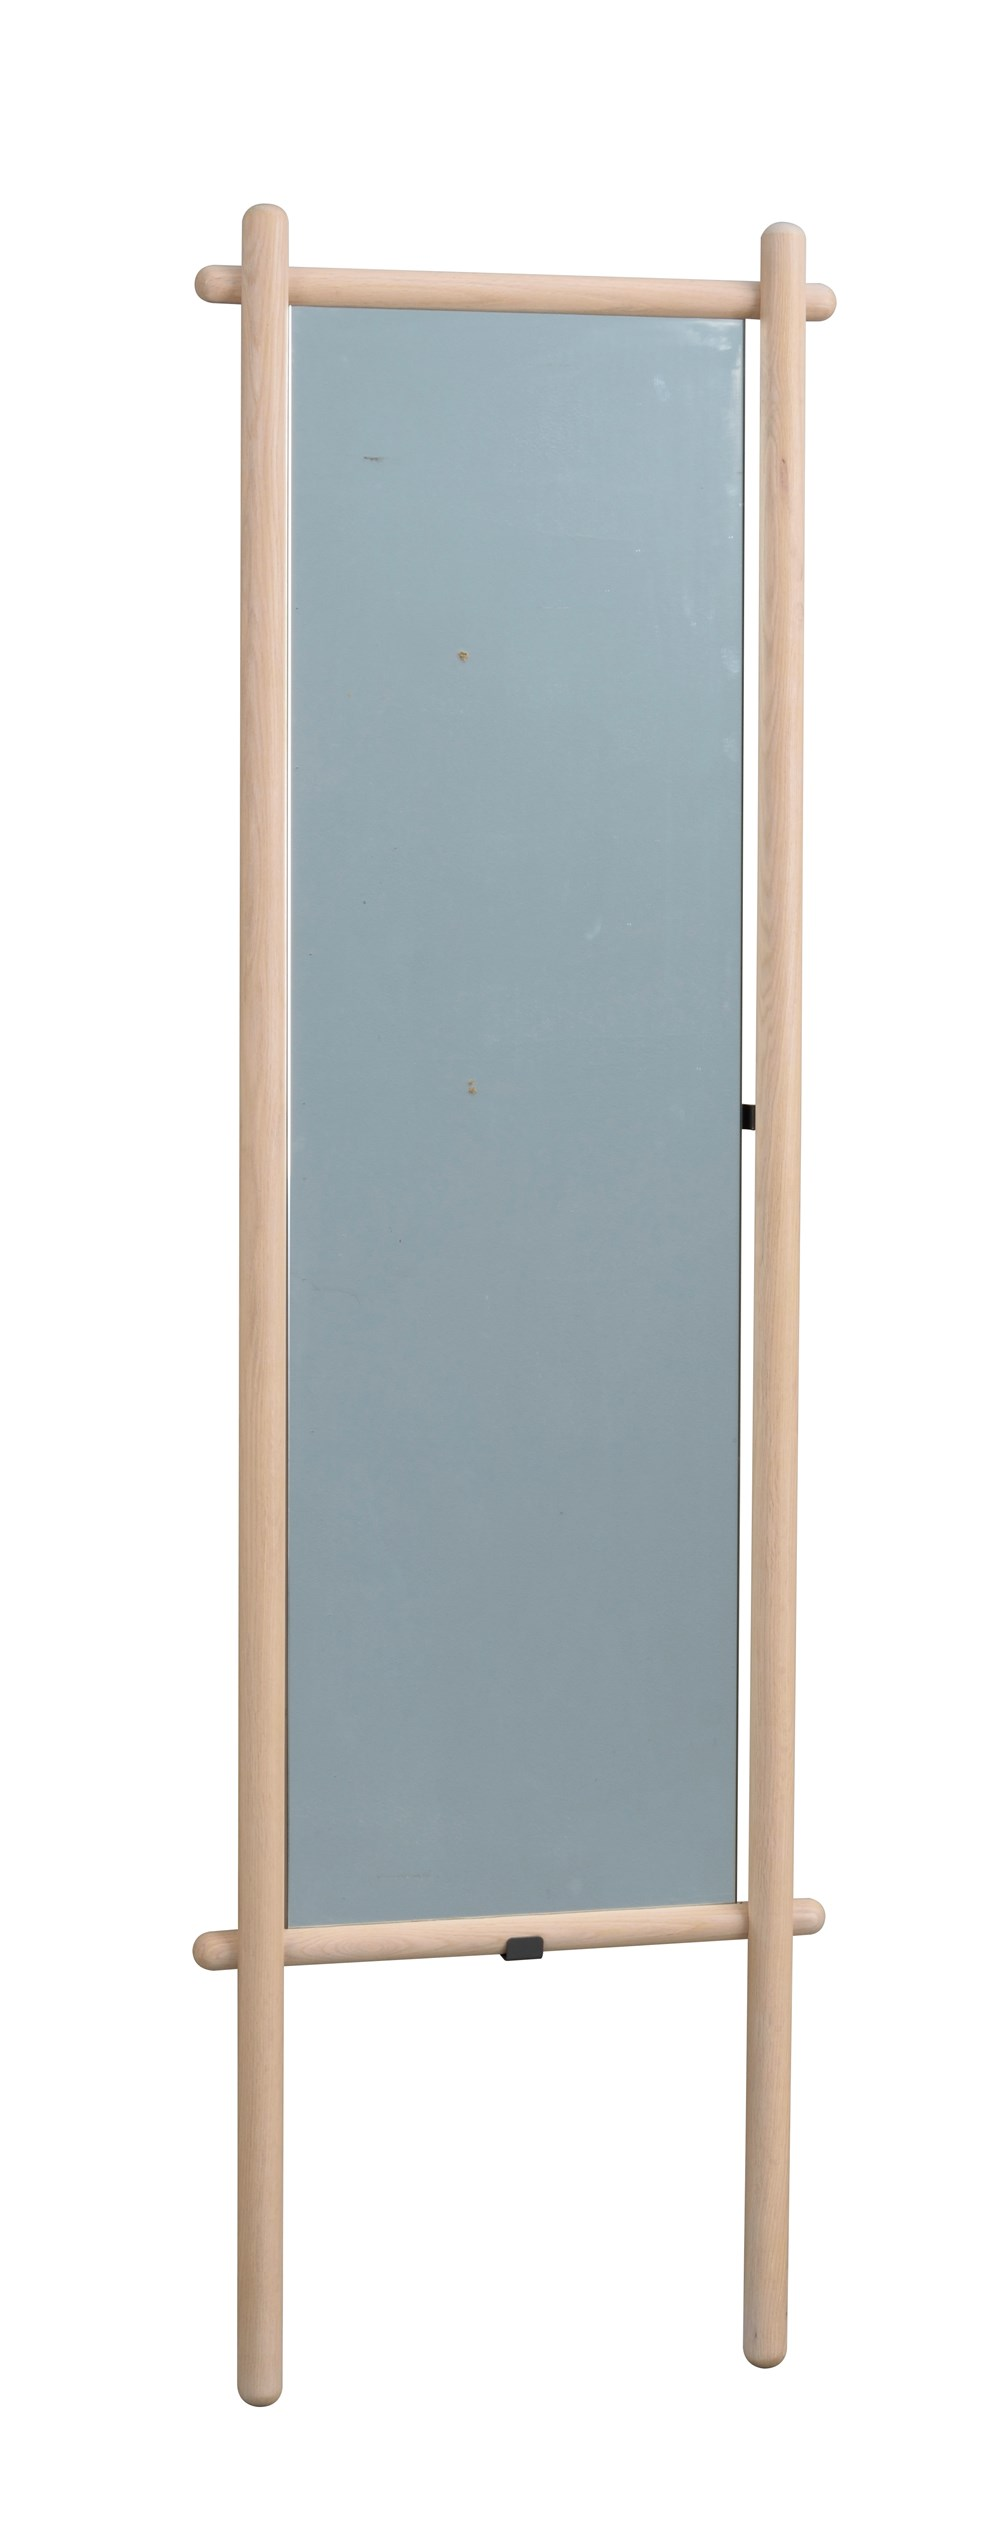 Milford lattiapeili 52x180 valkolakattu tammi, Rowico